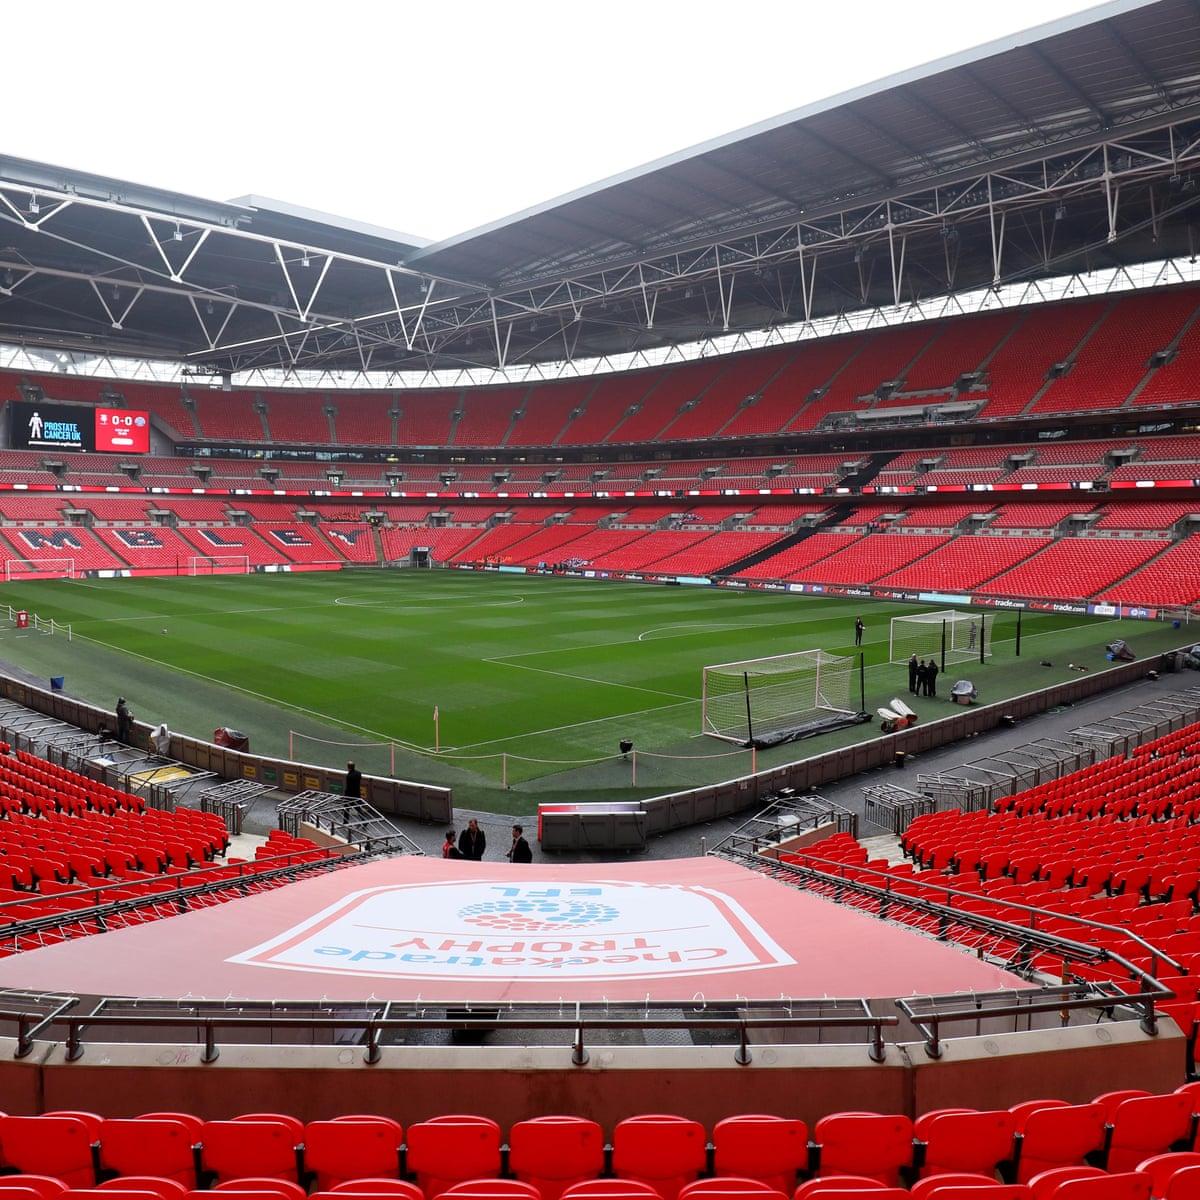 Premier League Should Contribute More After Collapse Of Wembley Sale David Conn Football The Guardian